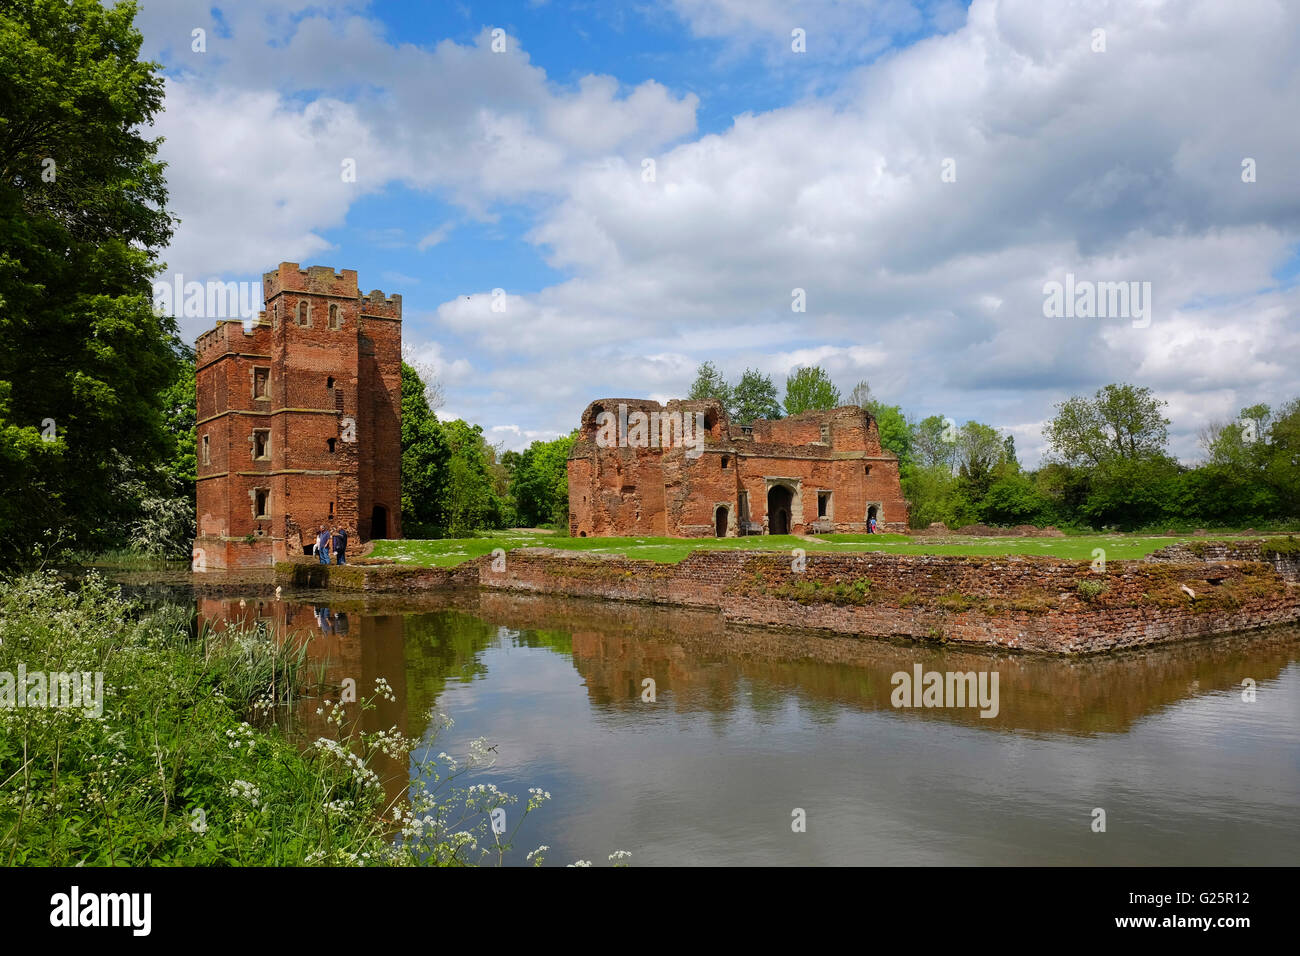 Kirby Muxloe Castle ruins, Leicestershire, England, UK - Stock Image